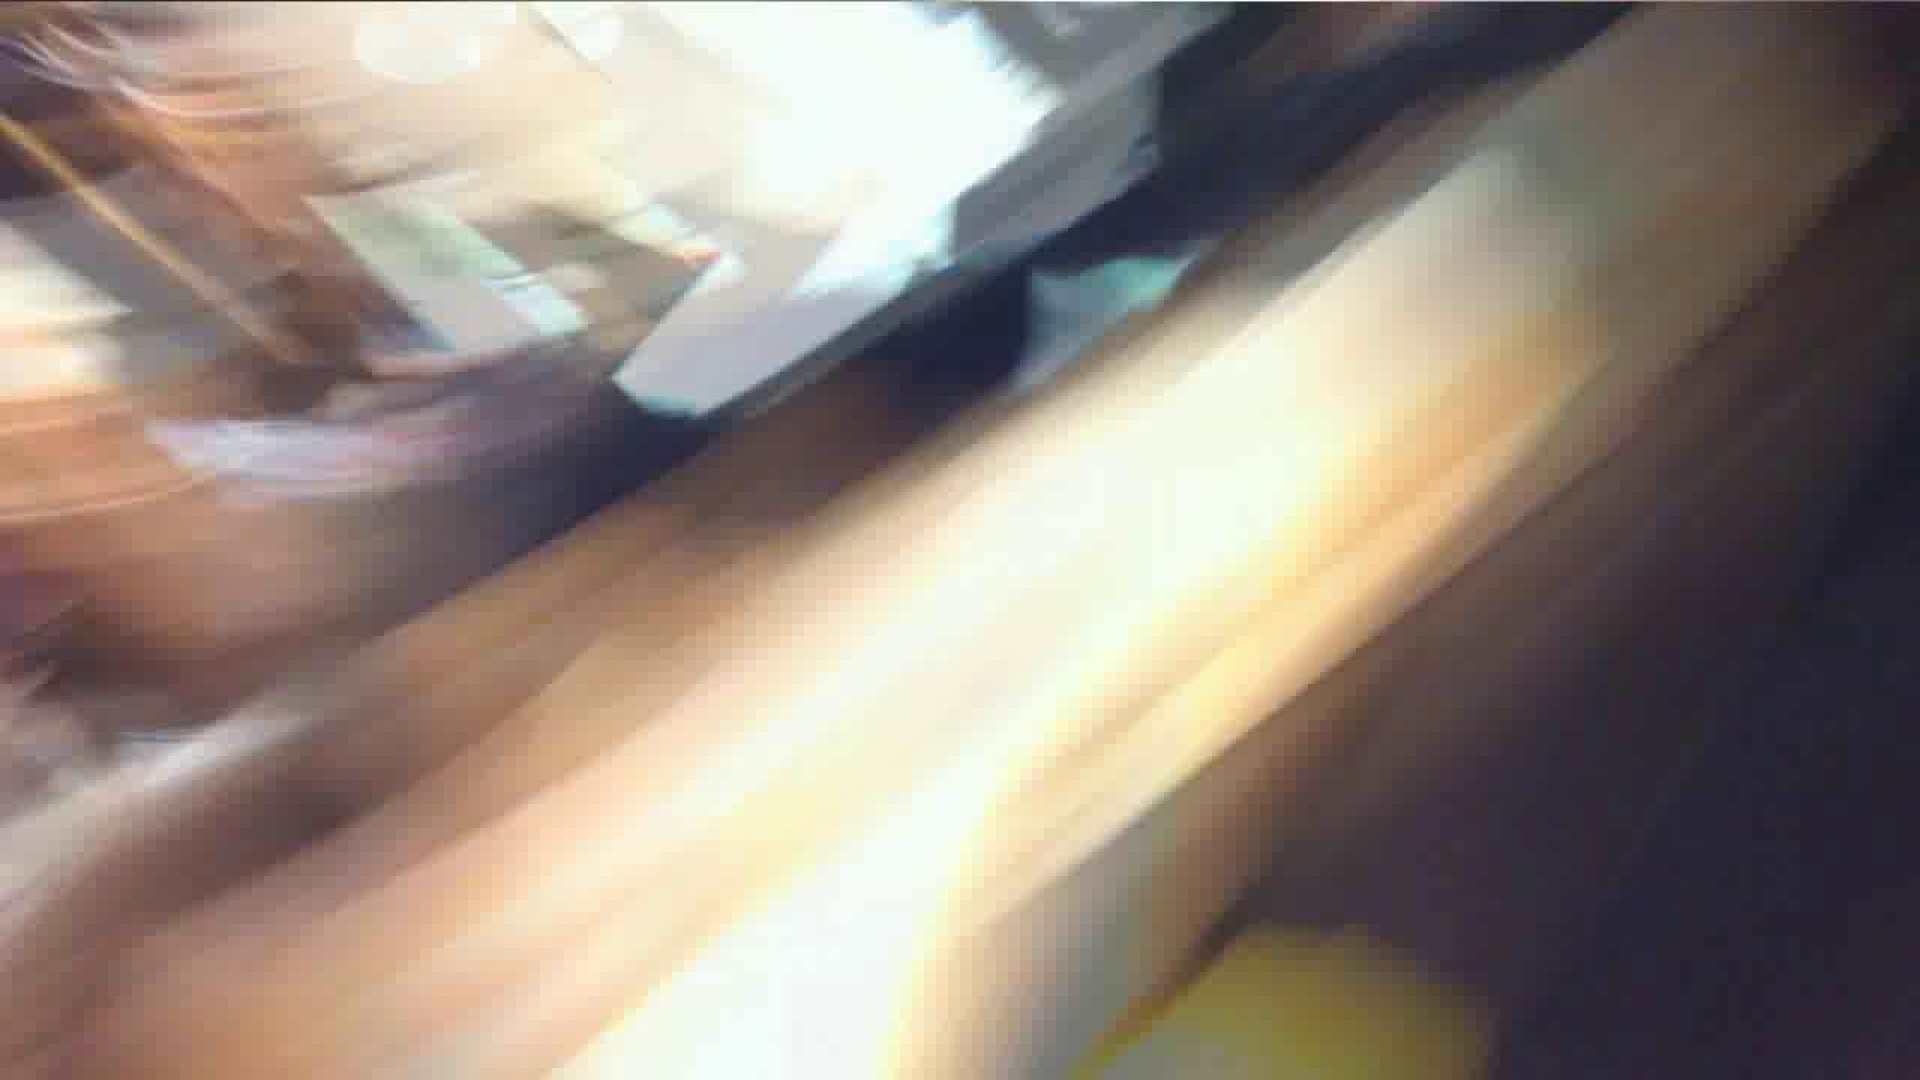 vol.33 美人アパレル胸チラ&パンチラ ギャル系ネーチャンの下着 下着姿 盗み撮り動画 94pic 87